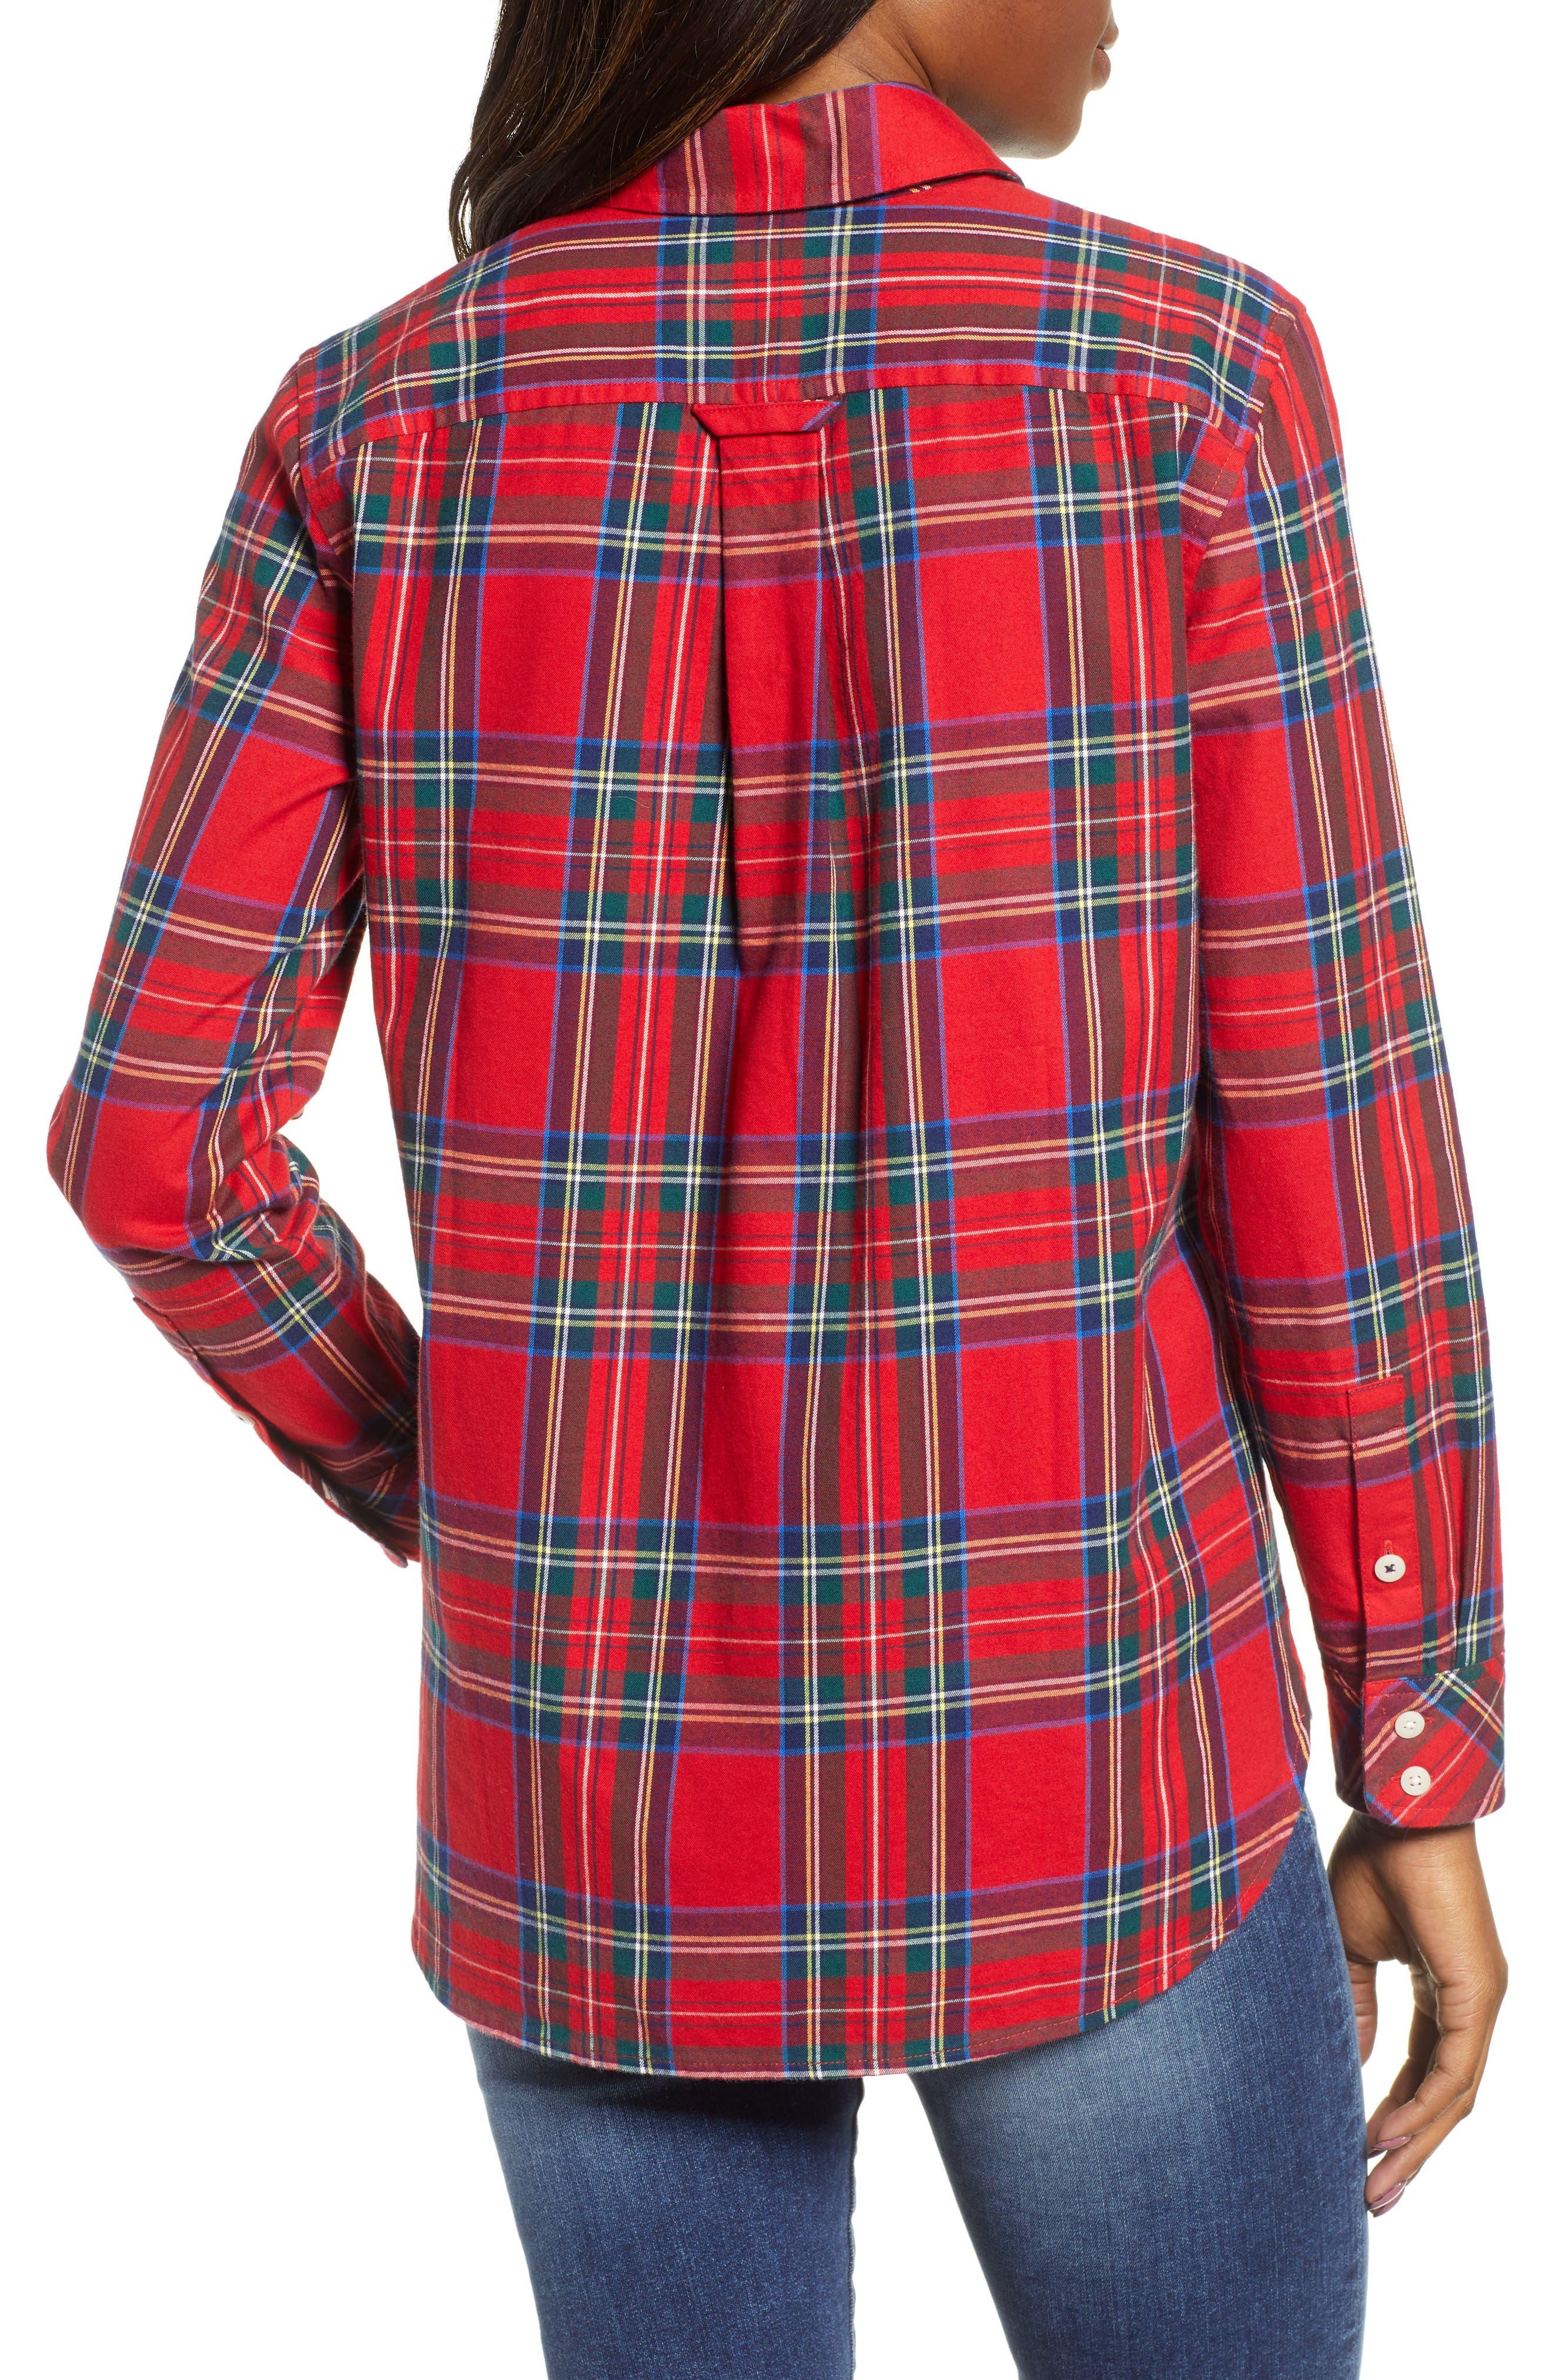 Morgan Jolly Plaid Flannel Shirt,                             Alternate thumbnail 2, color,                             600